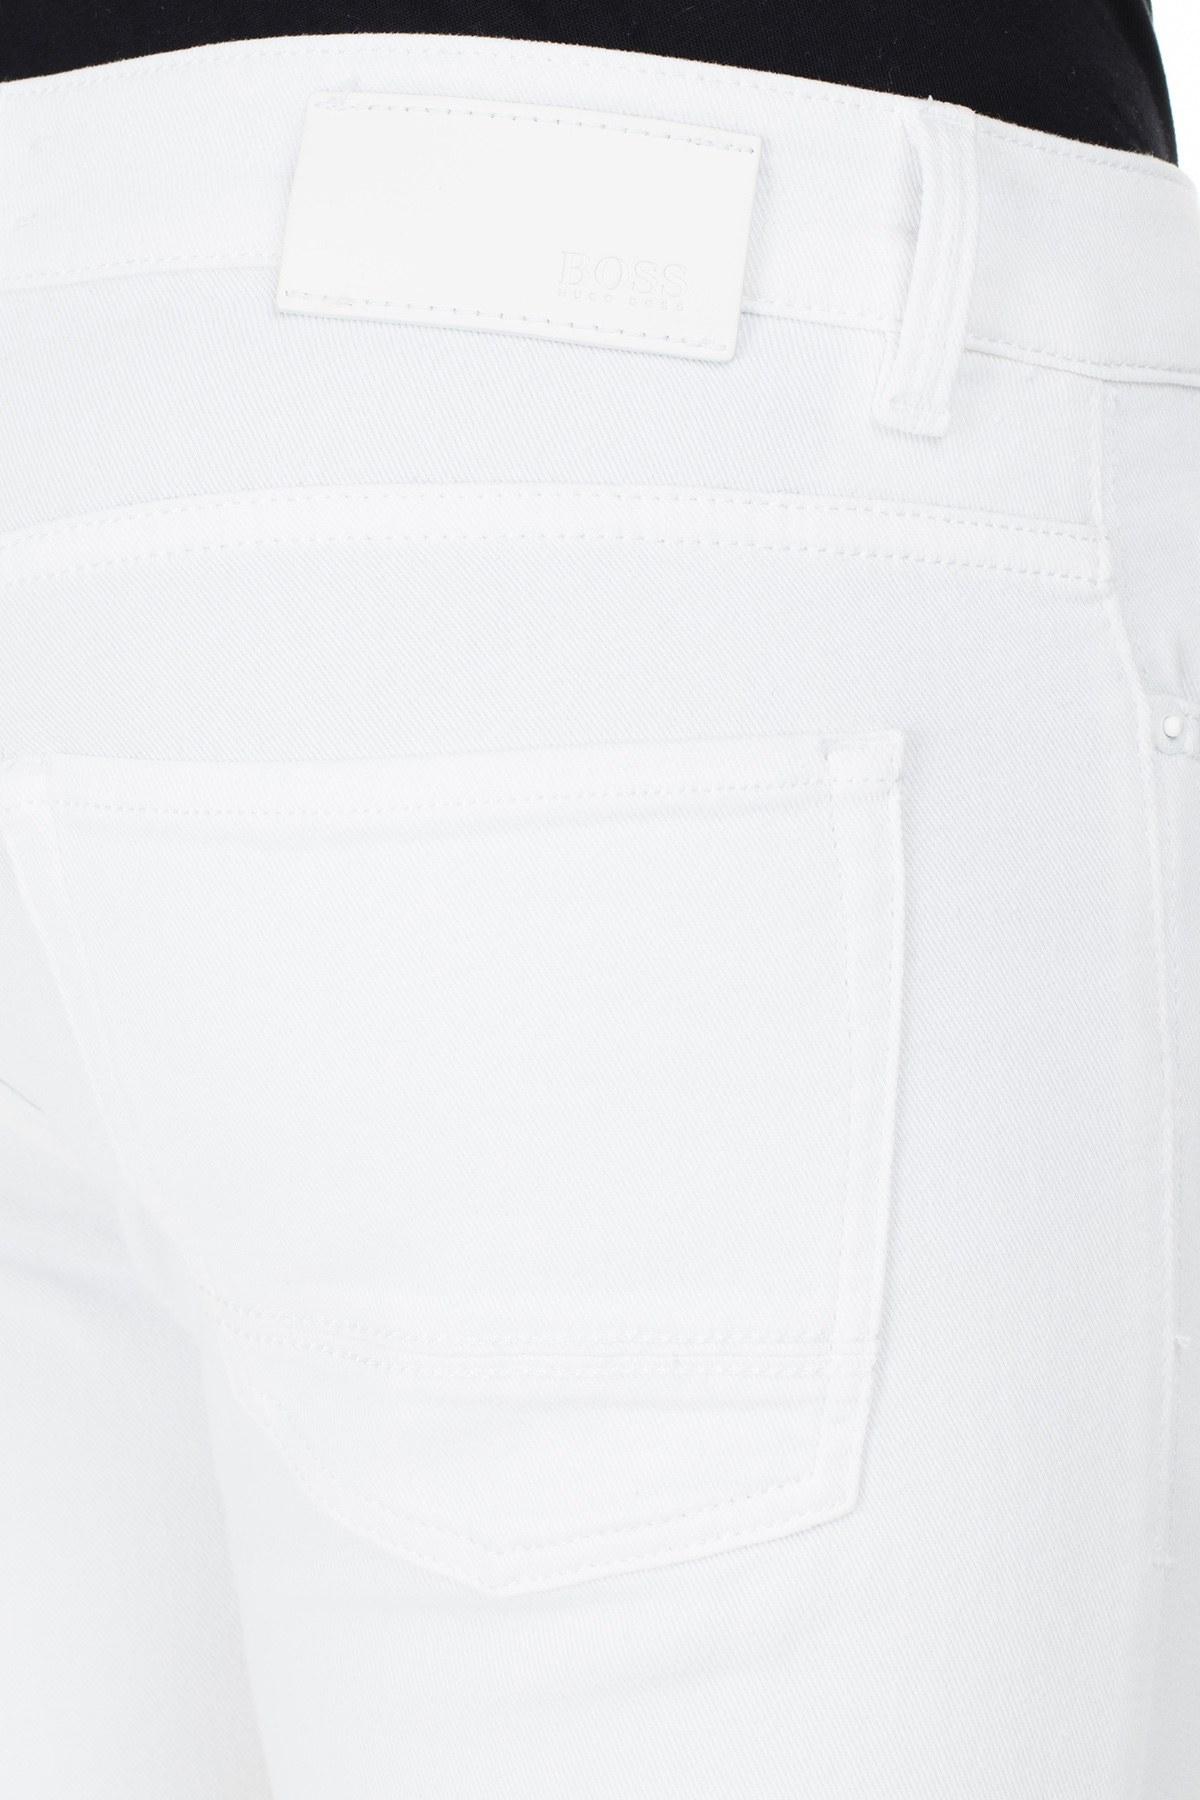 Hugo Boss Slim Fit Jeans Erkek Kot Pantolon 50426531 100 BEYAZ